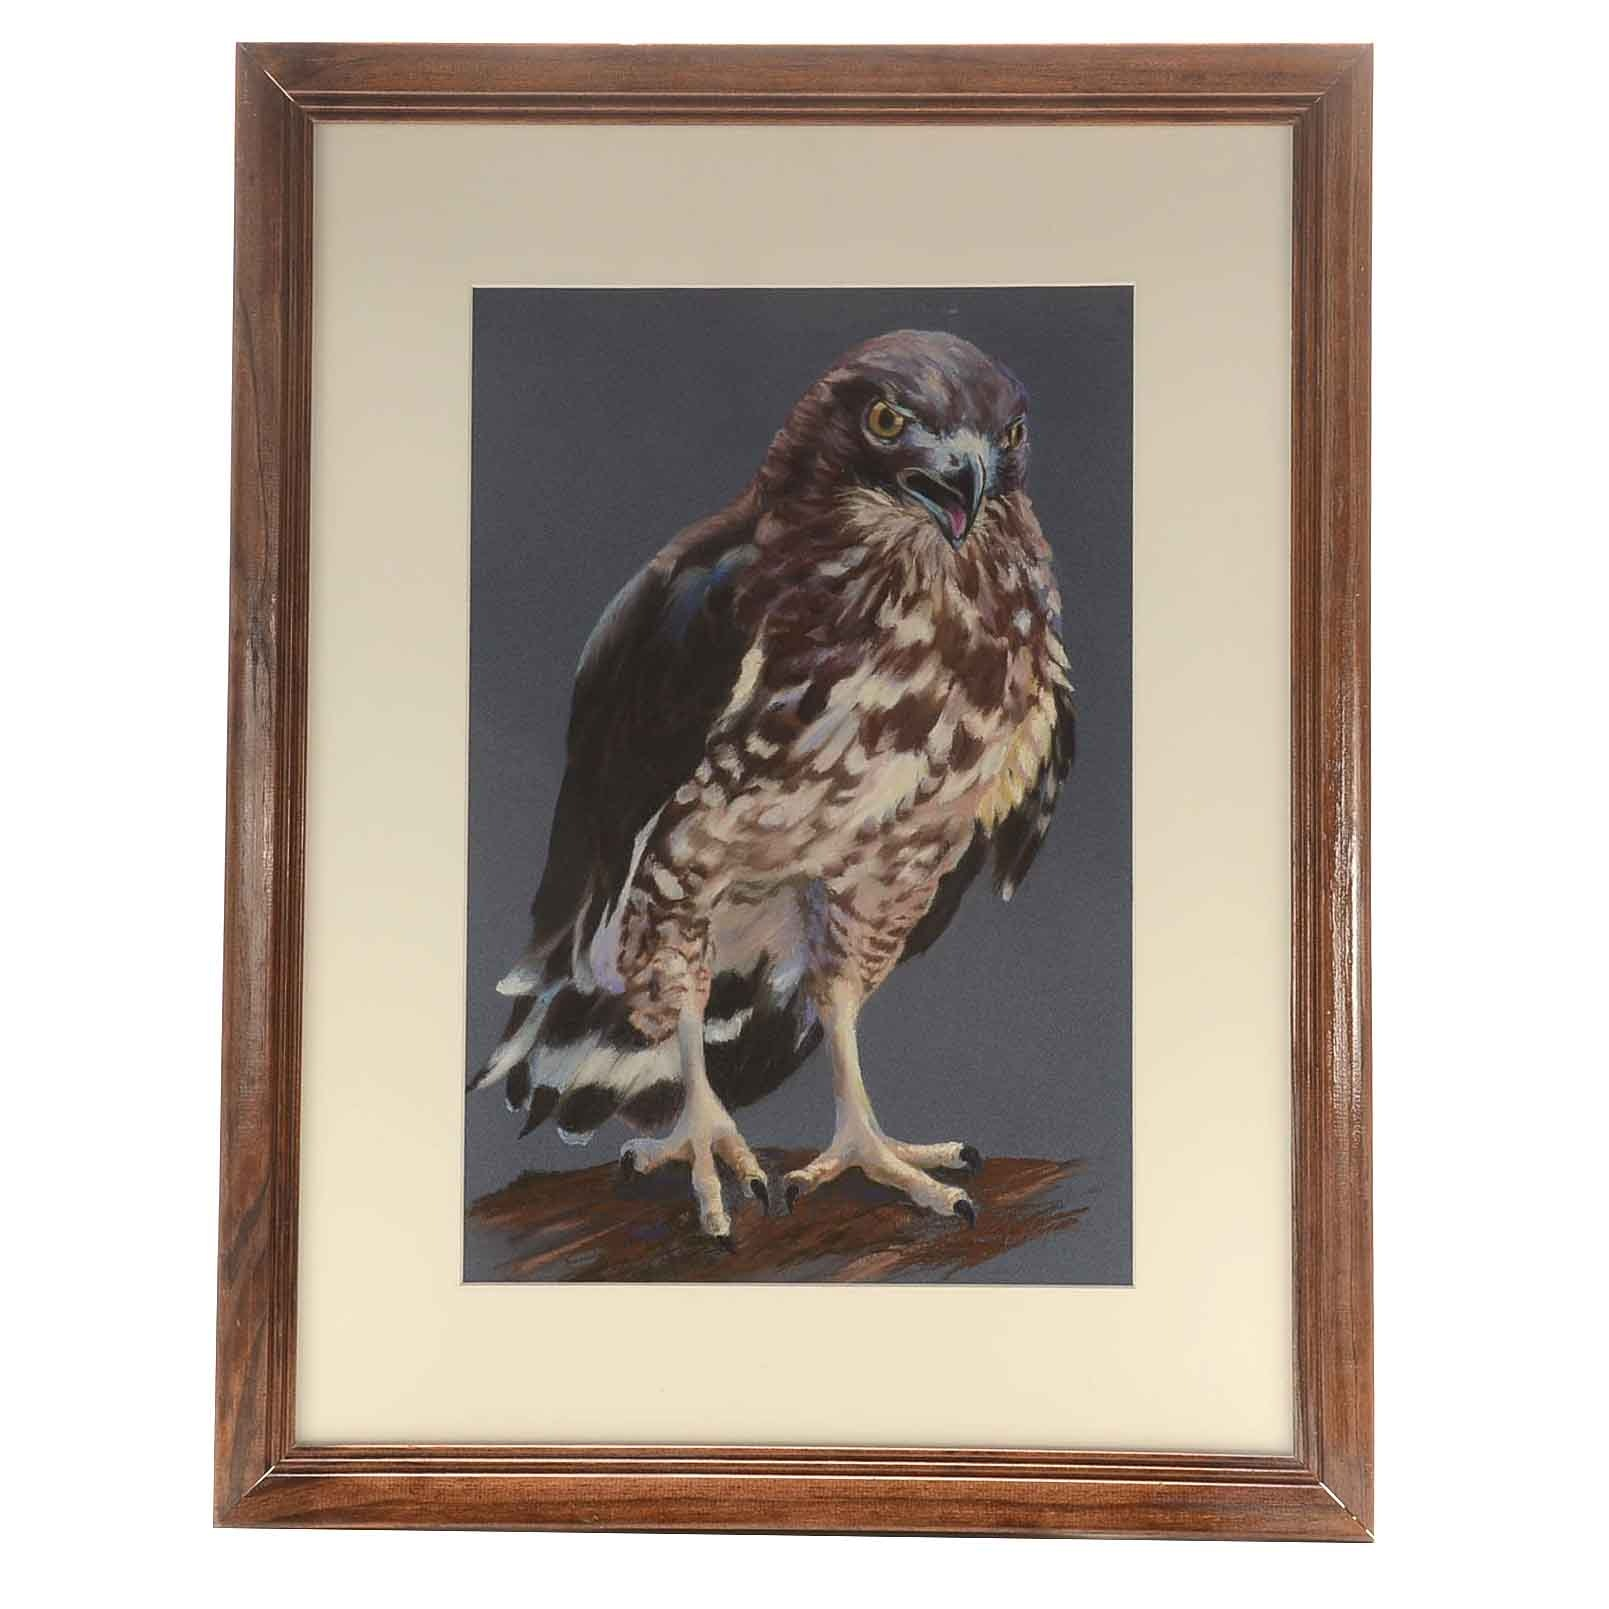 Deanna Boling Original Pastel Drawing of a Hawk